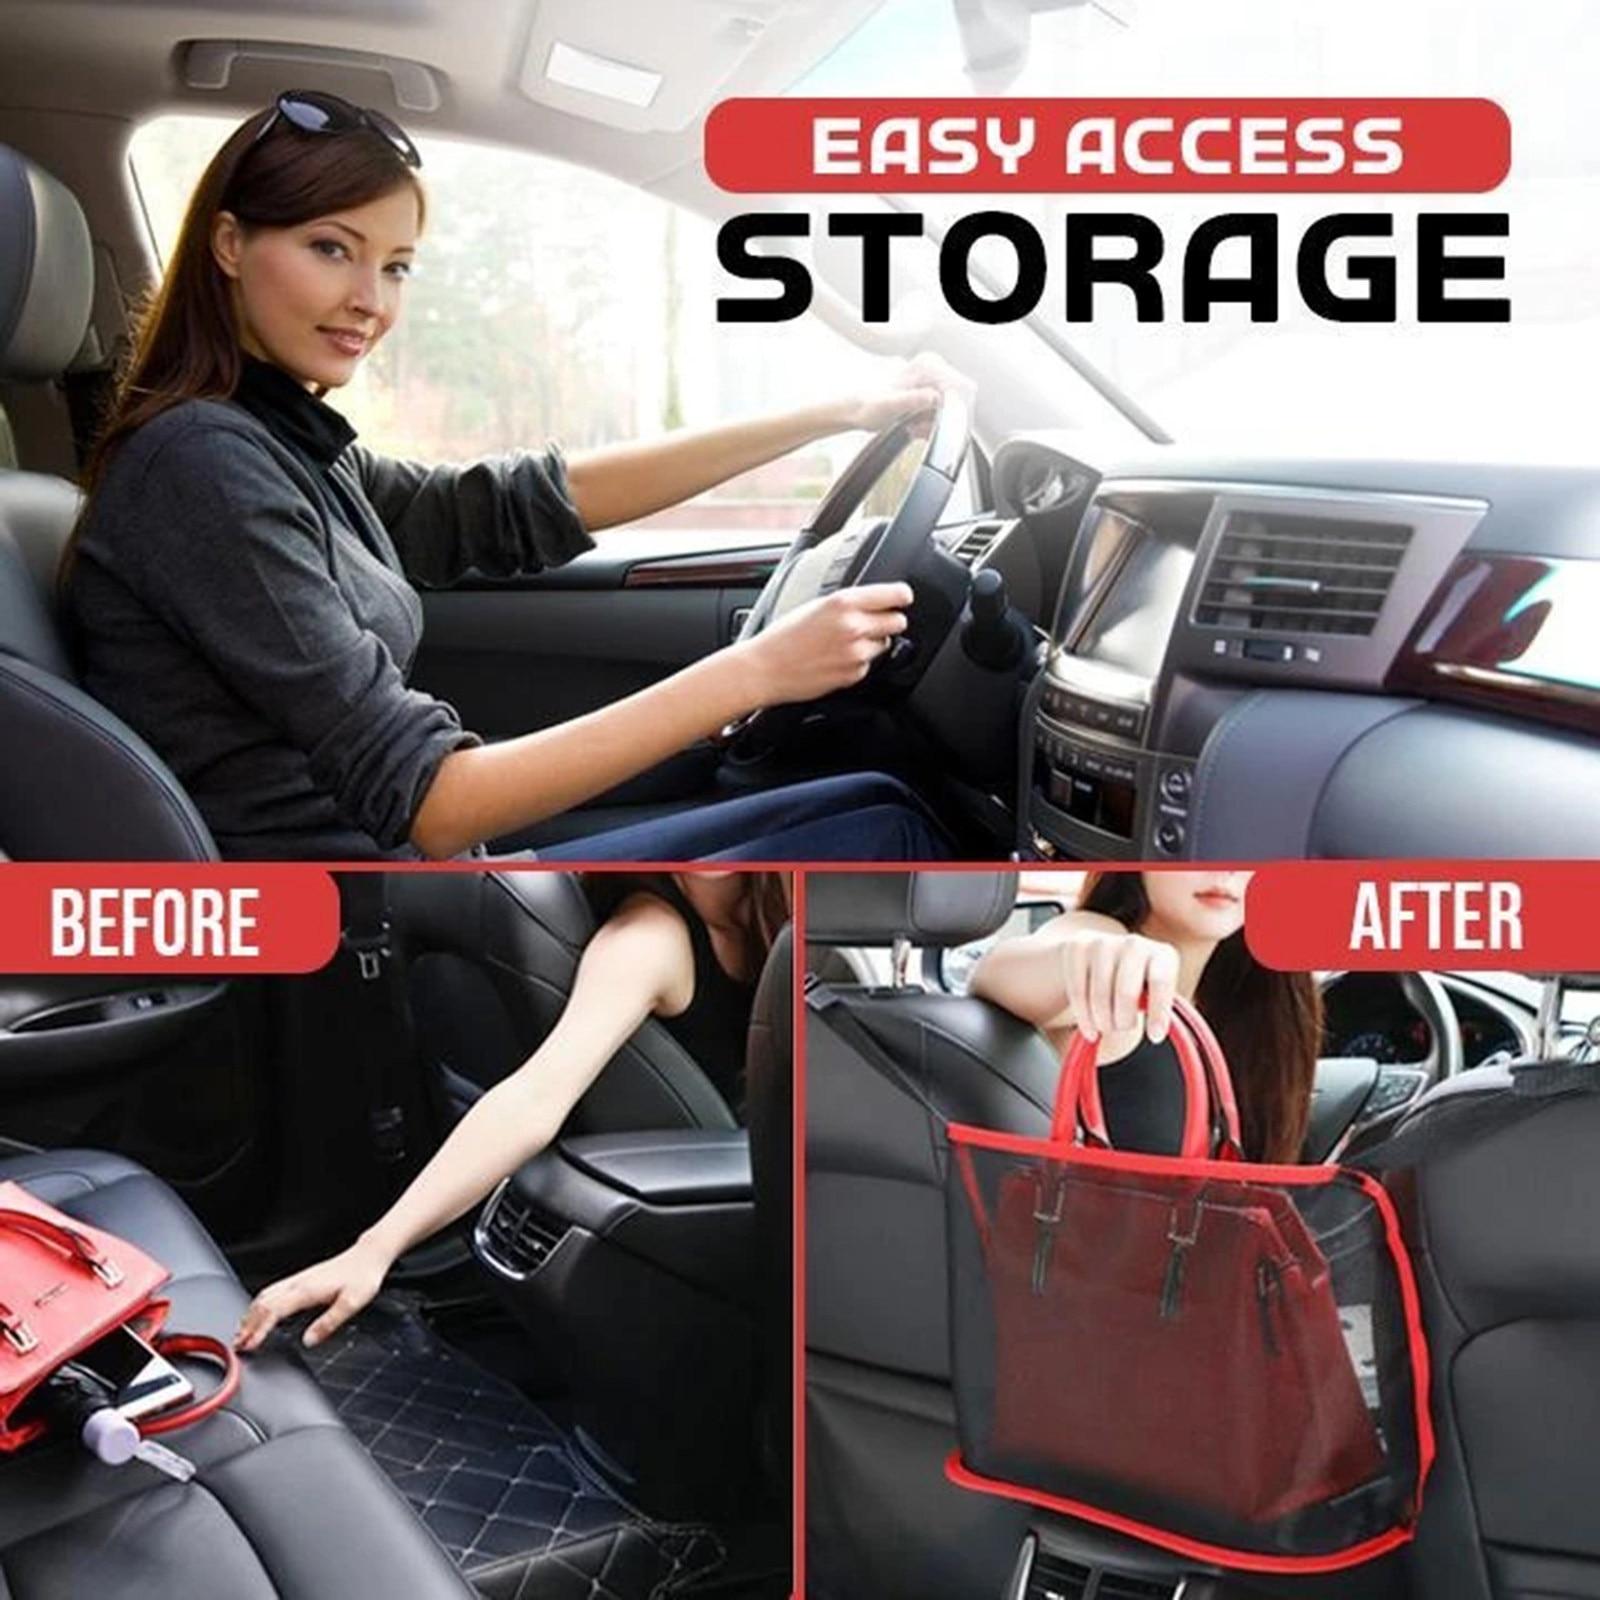 Front Seat Storage for Handbag Purse Tissue Phone Pet Barrier BAOWA Car Net Pocket Handbag Holder Standard, Black Car Mesh Organizer Car Net Pocket Organizer